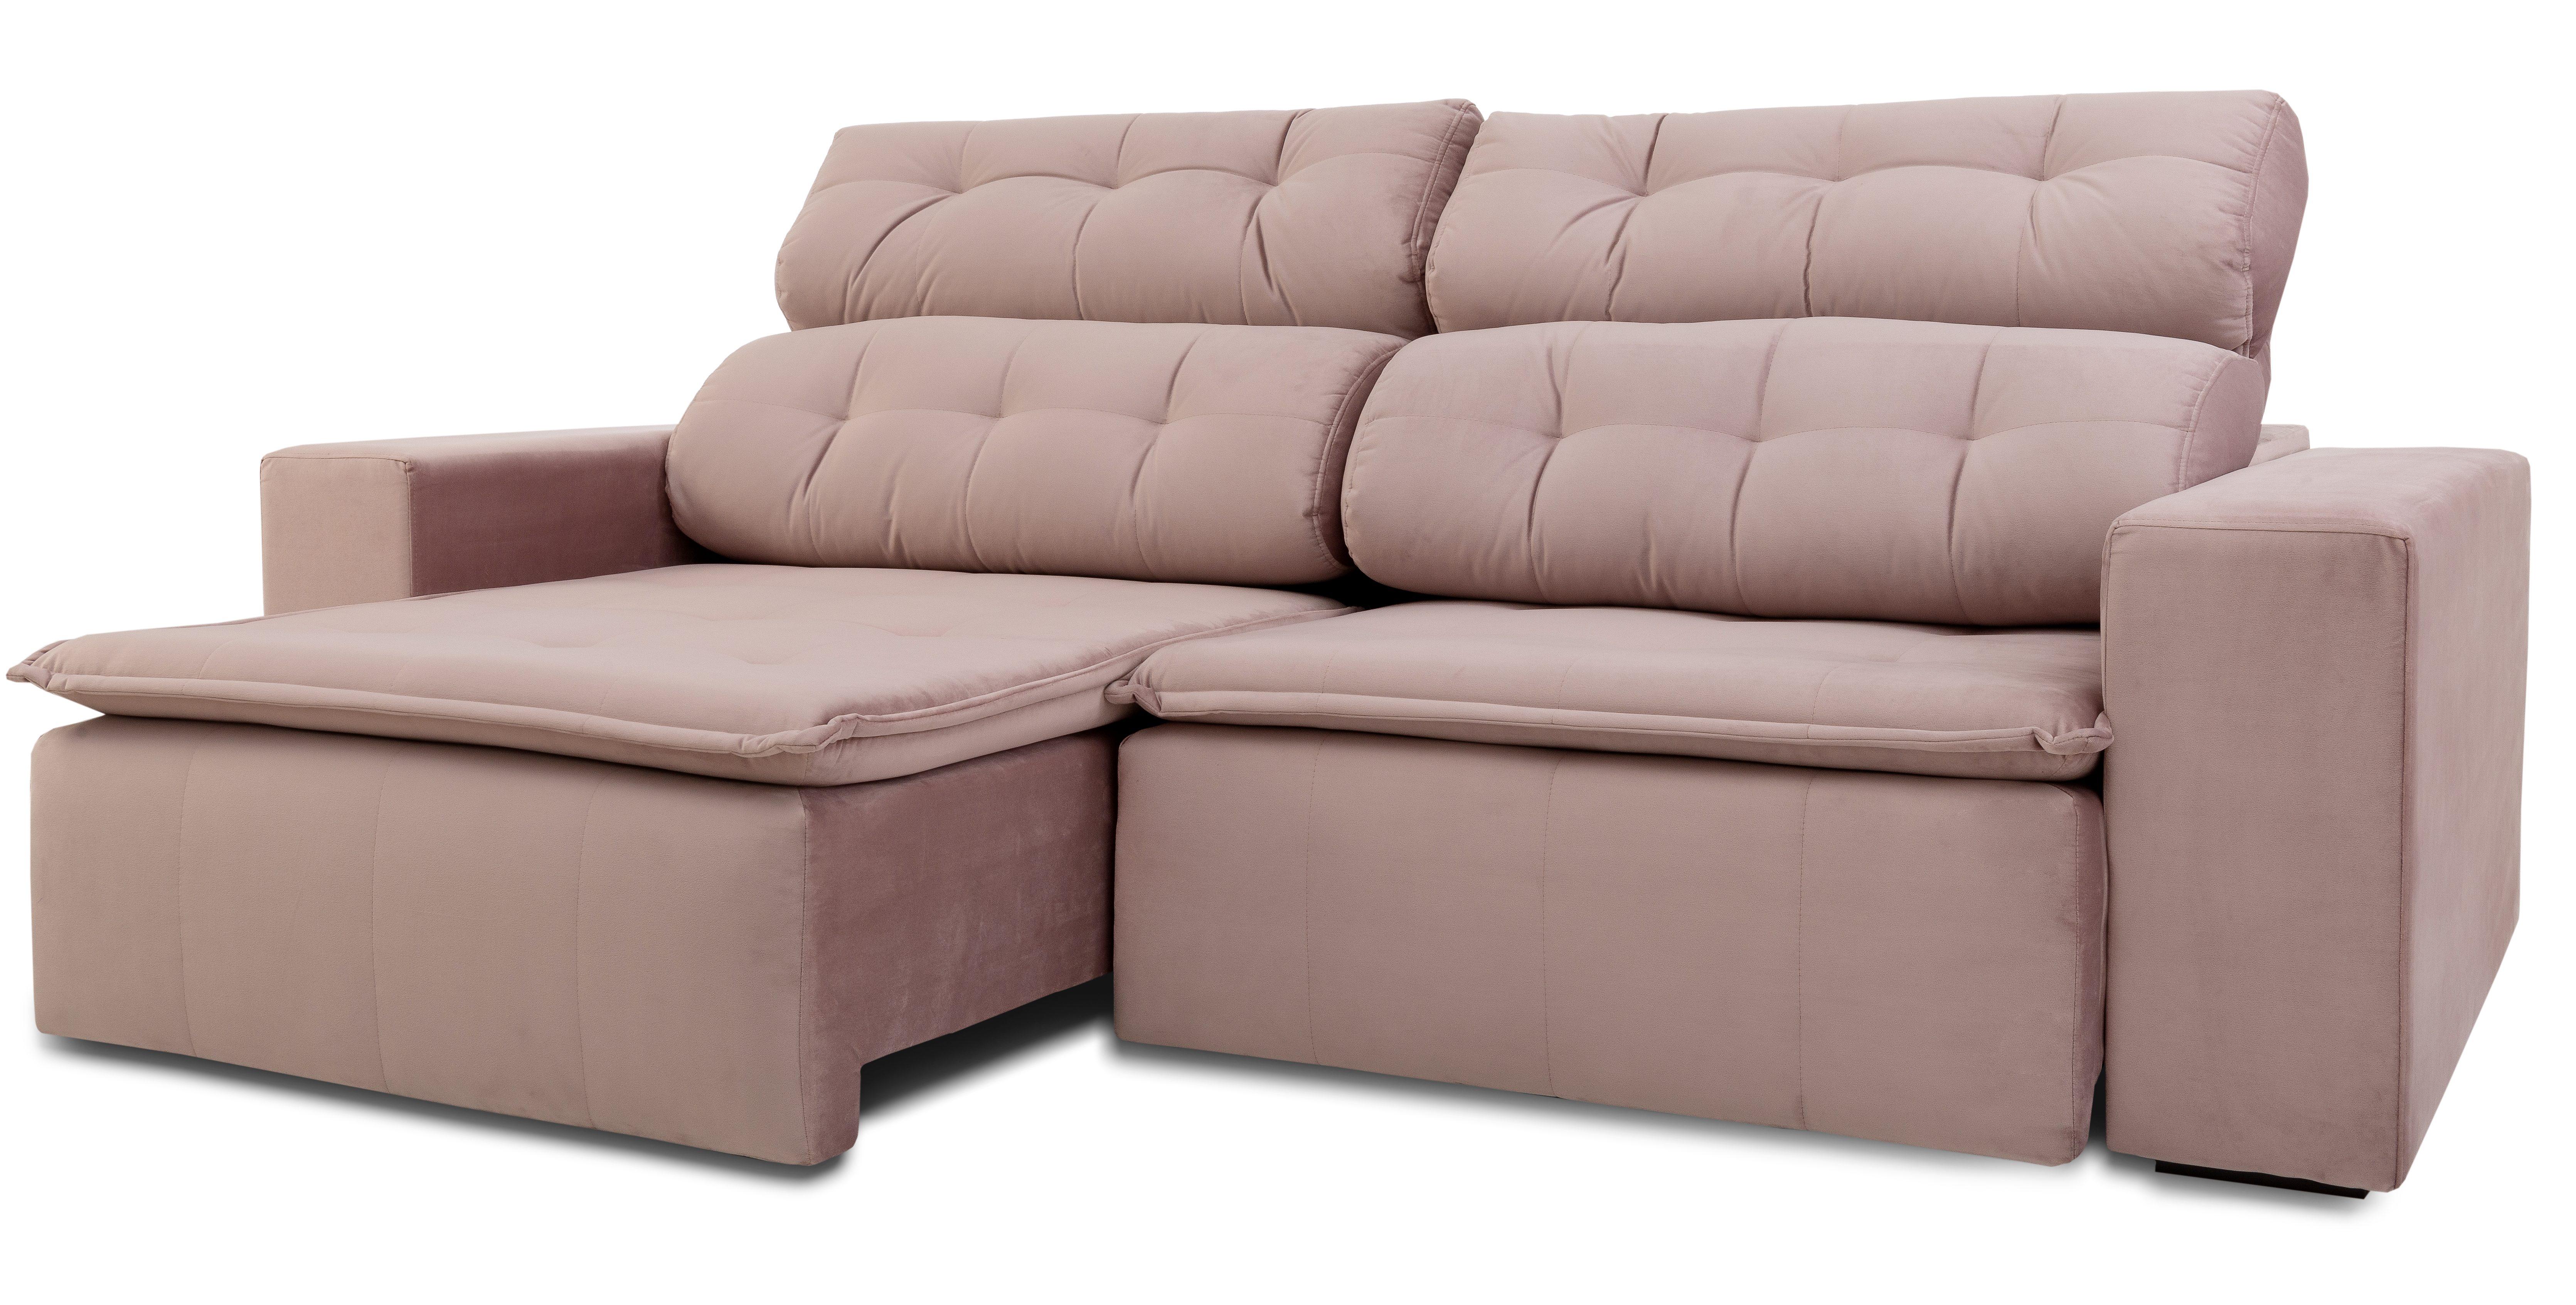 sofá sidlar